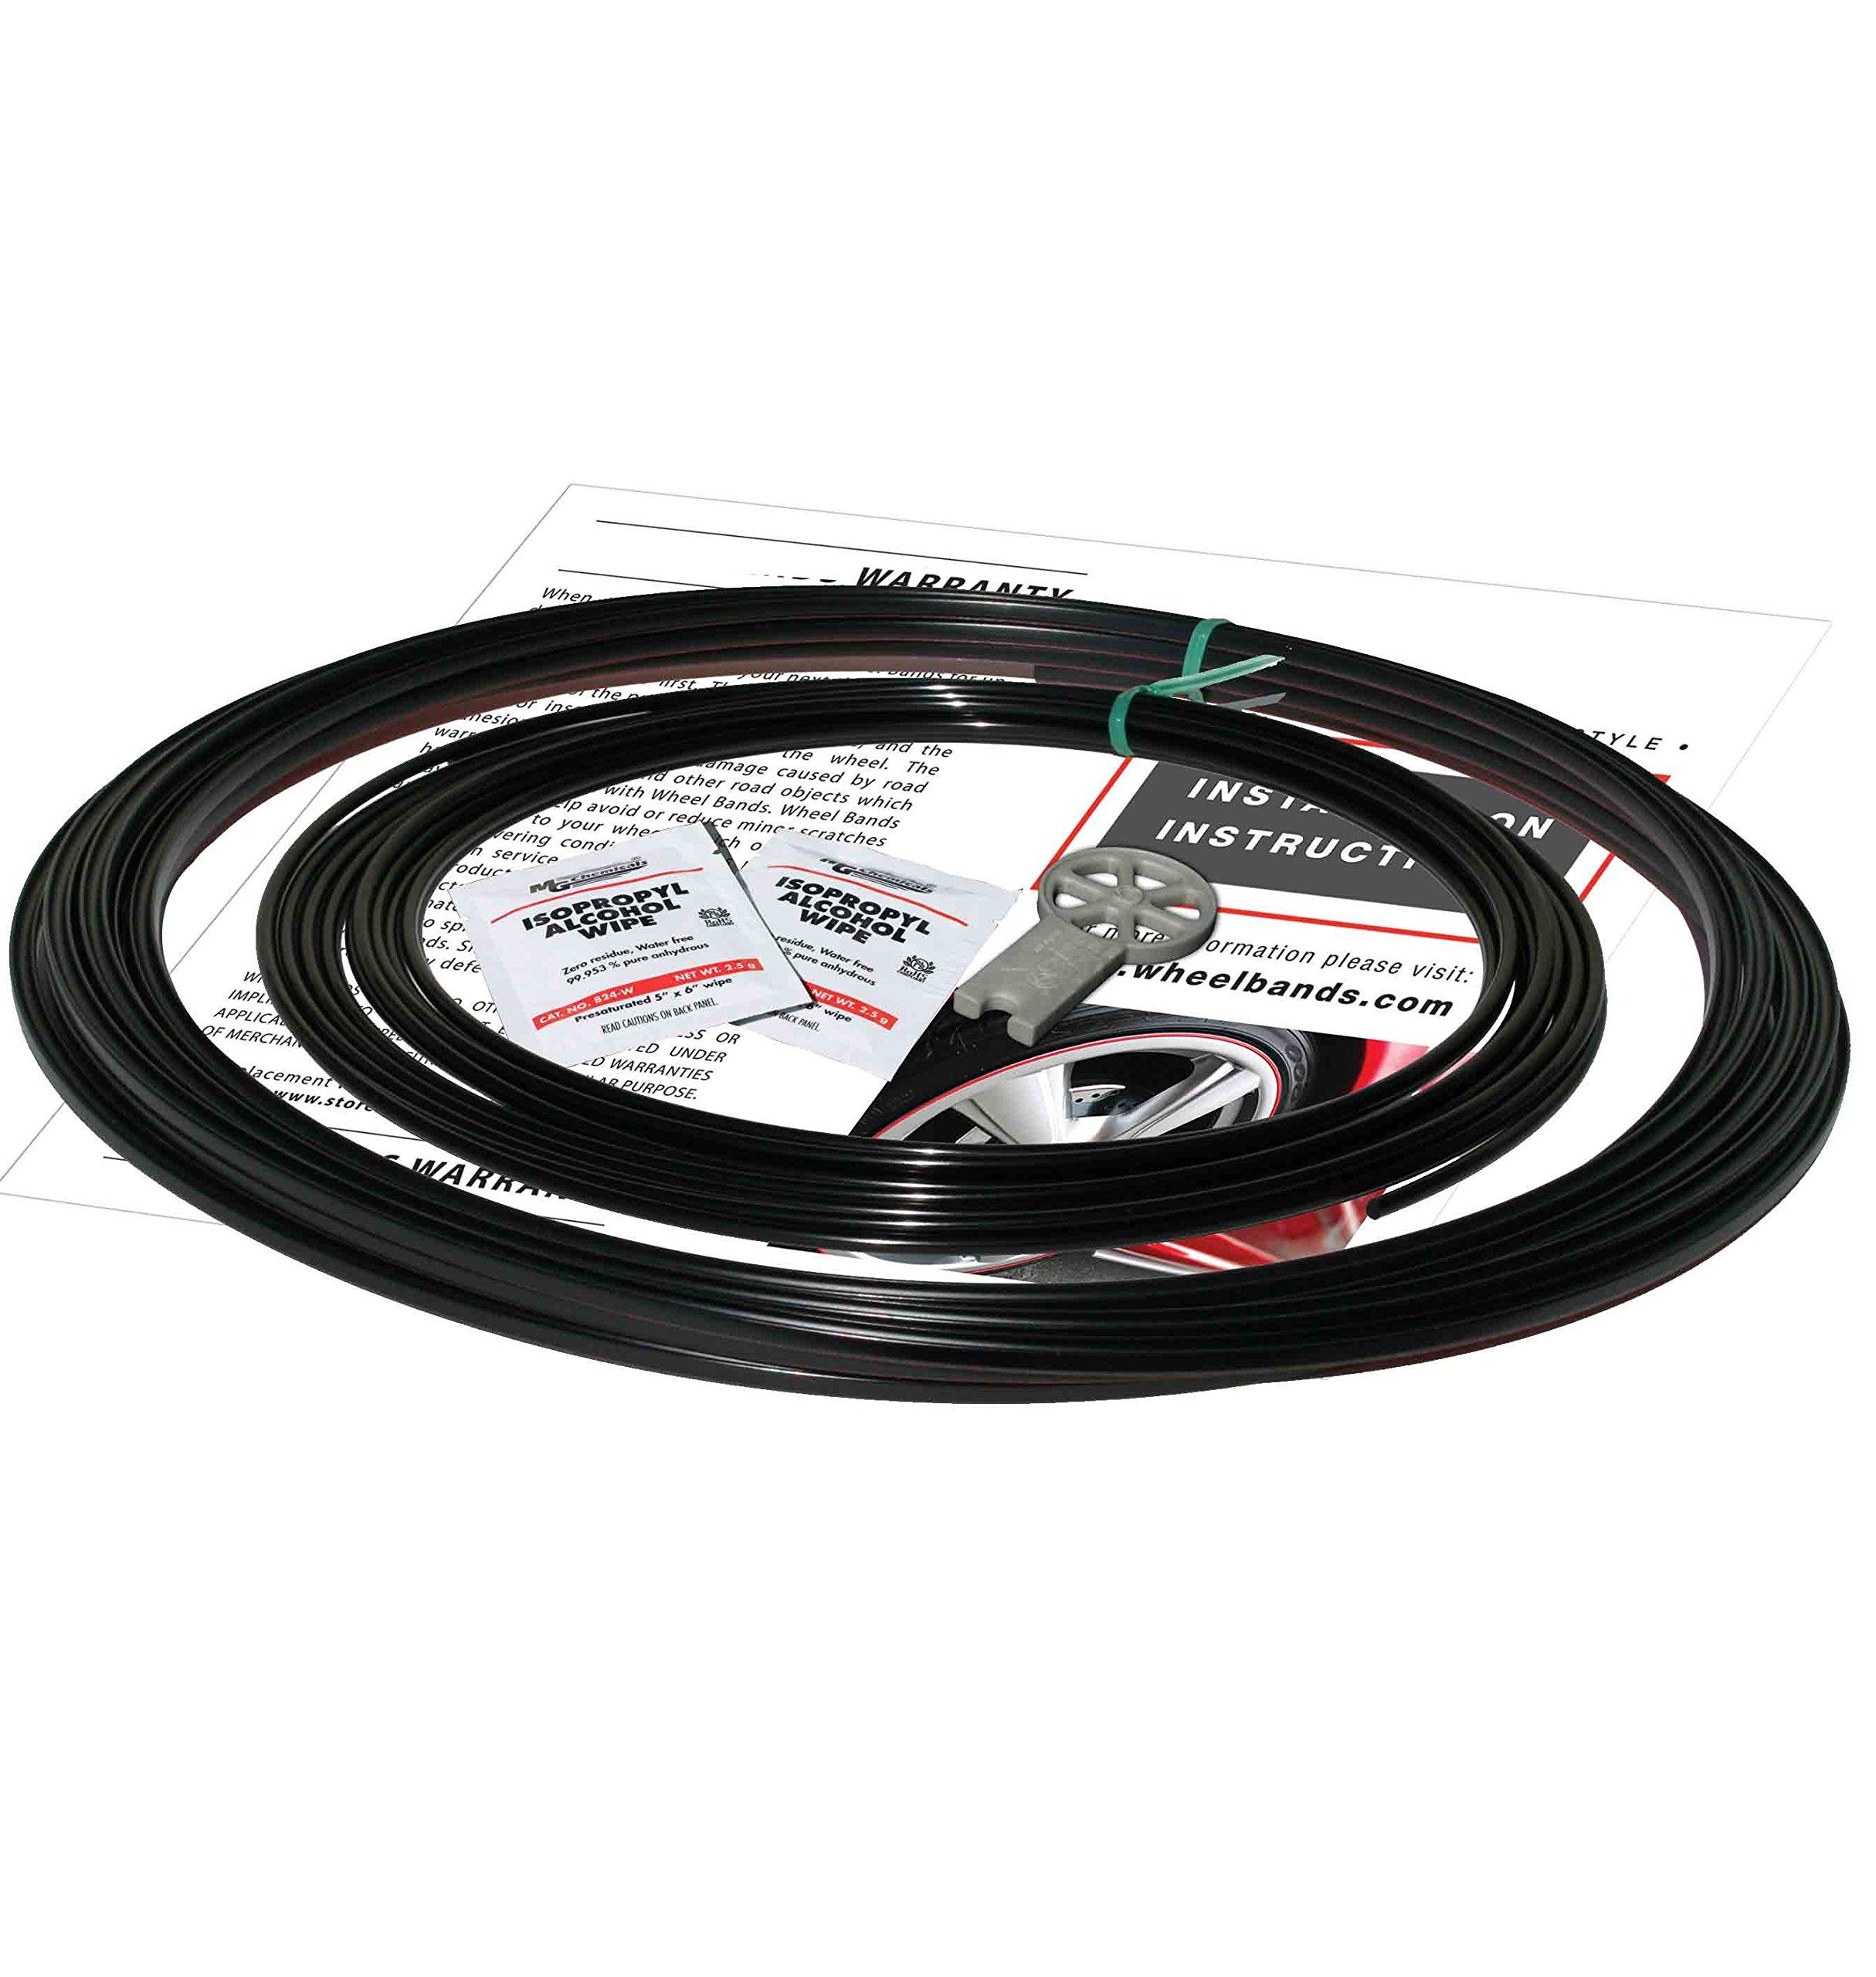 RimPro-Tec Wheel Rim Protection Full Kit, Set of 4 x Black Bases and Black Inners